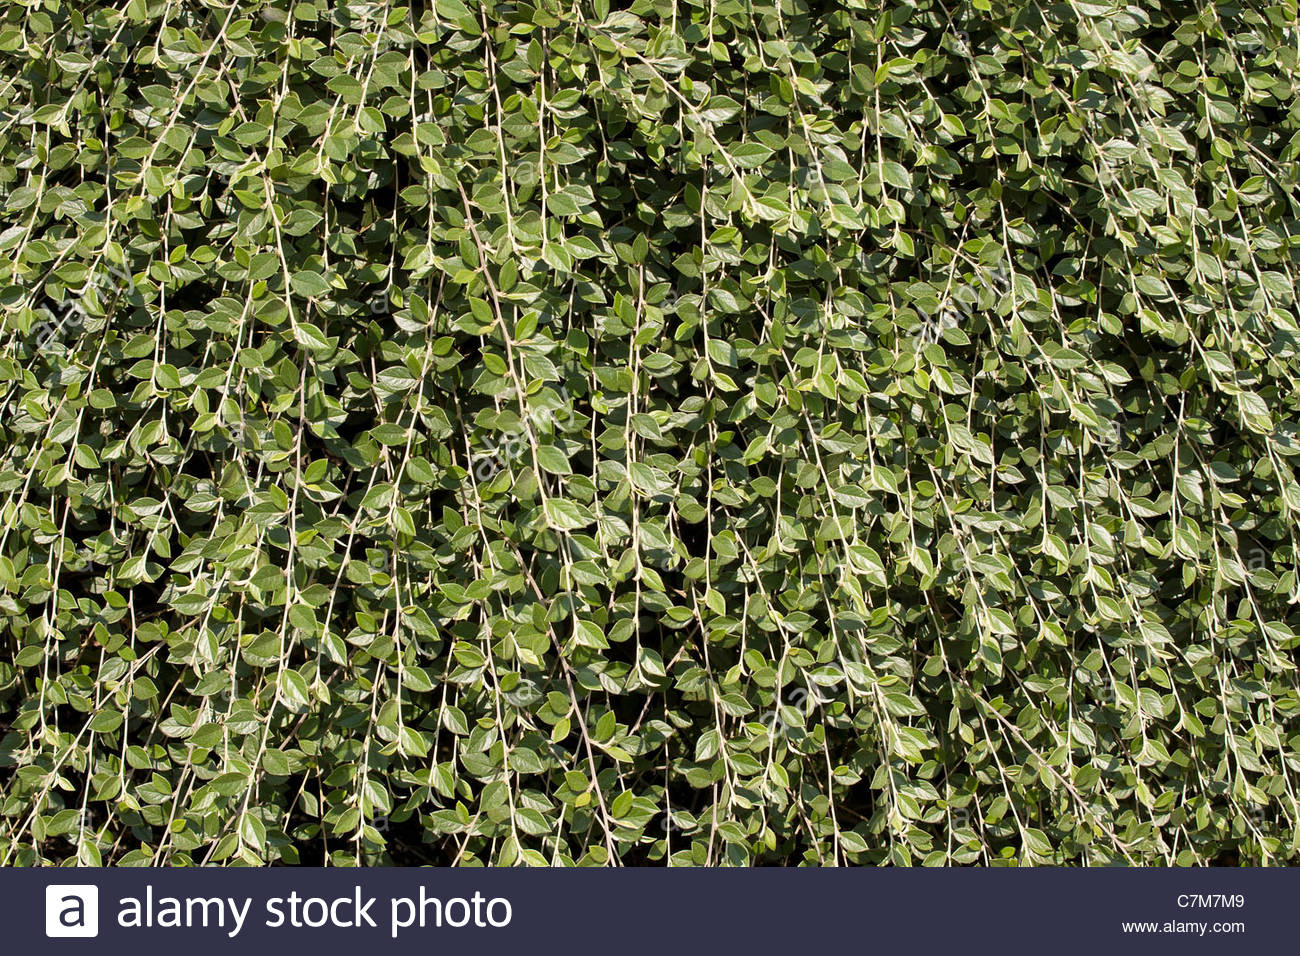 Climbing Vines Plant Background Stock Photo 39168425   Alamy 1300x956